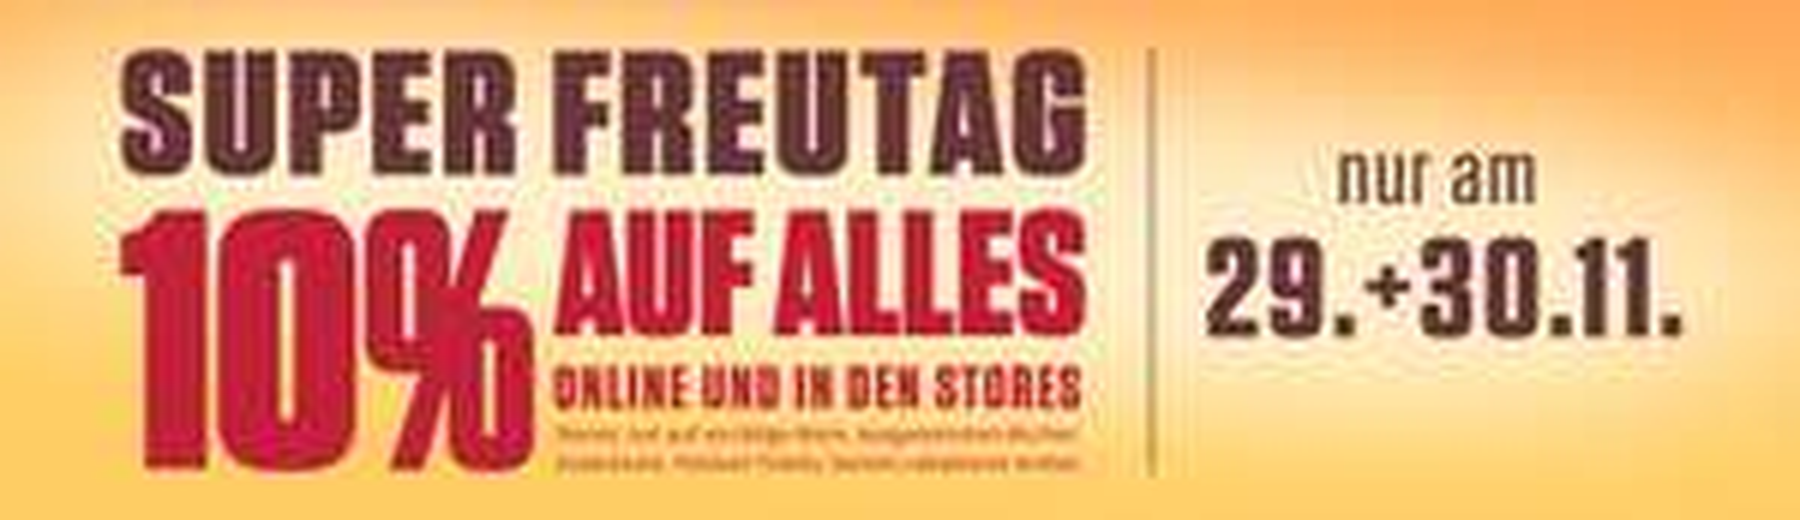 SUPER FREUTAG bei Elbenwald - 10% auf ALLES (29.11. + 30.11.)